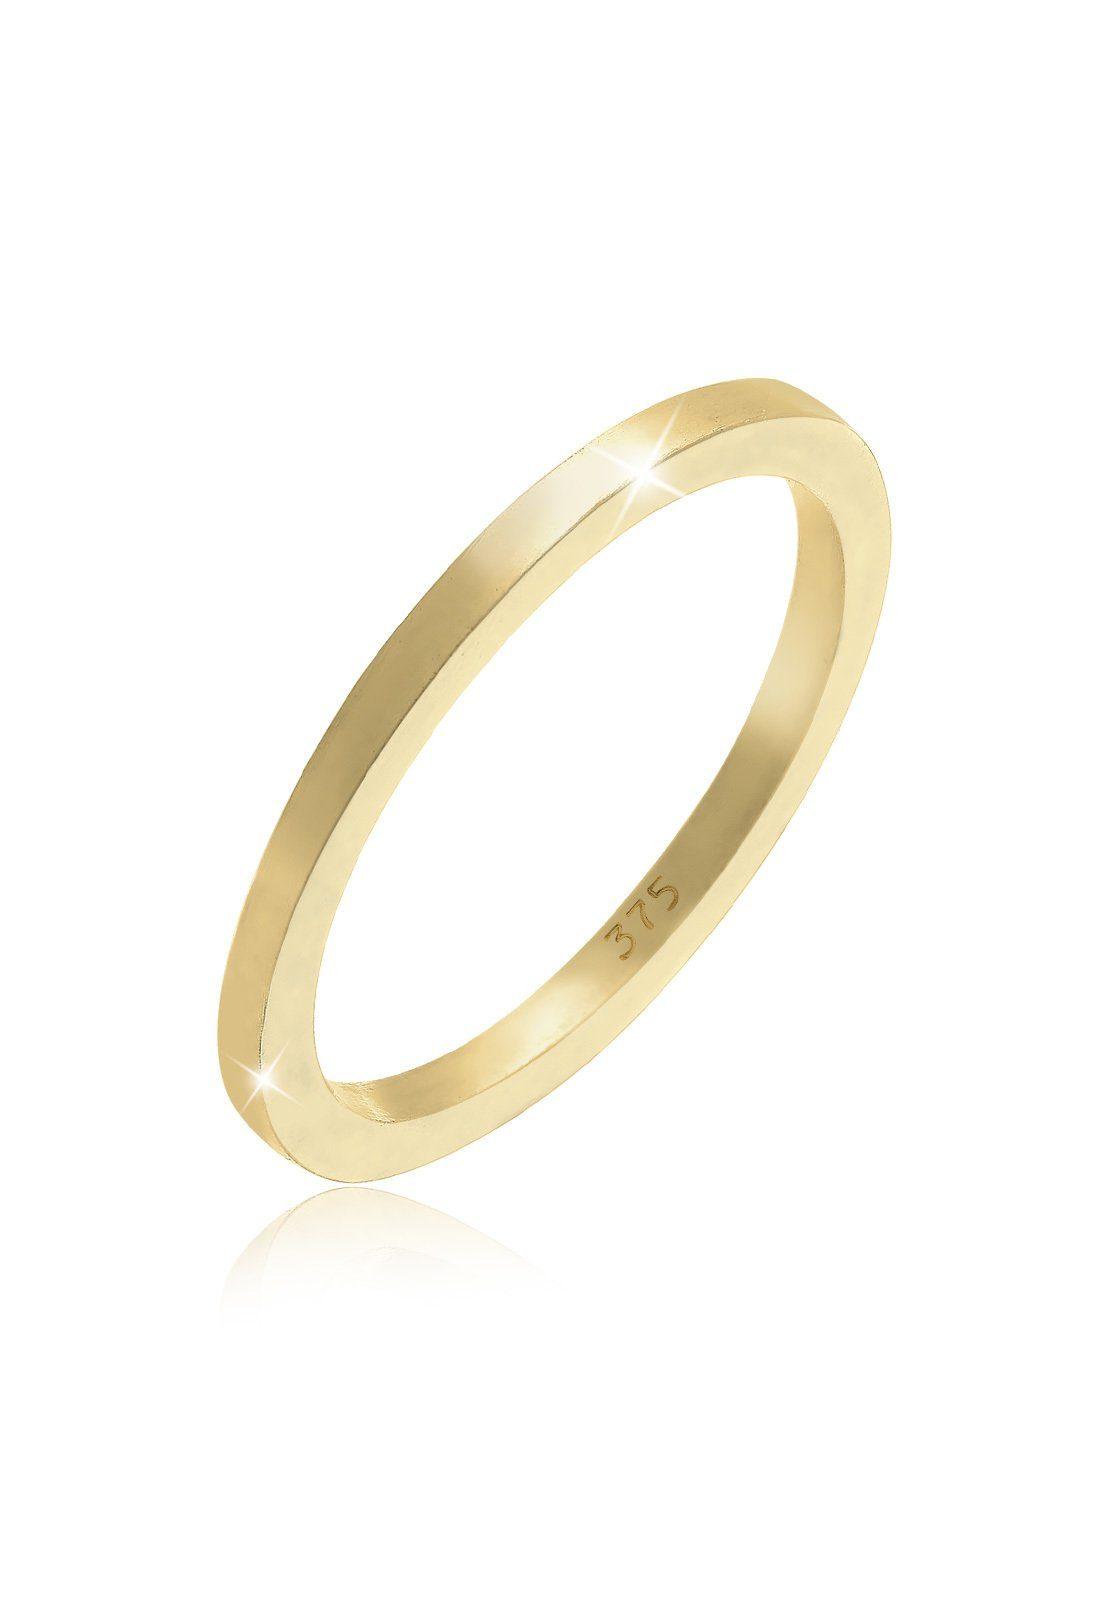 Elli Fingerring Basic Ehering 375 Gelbgold  OTTO